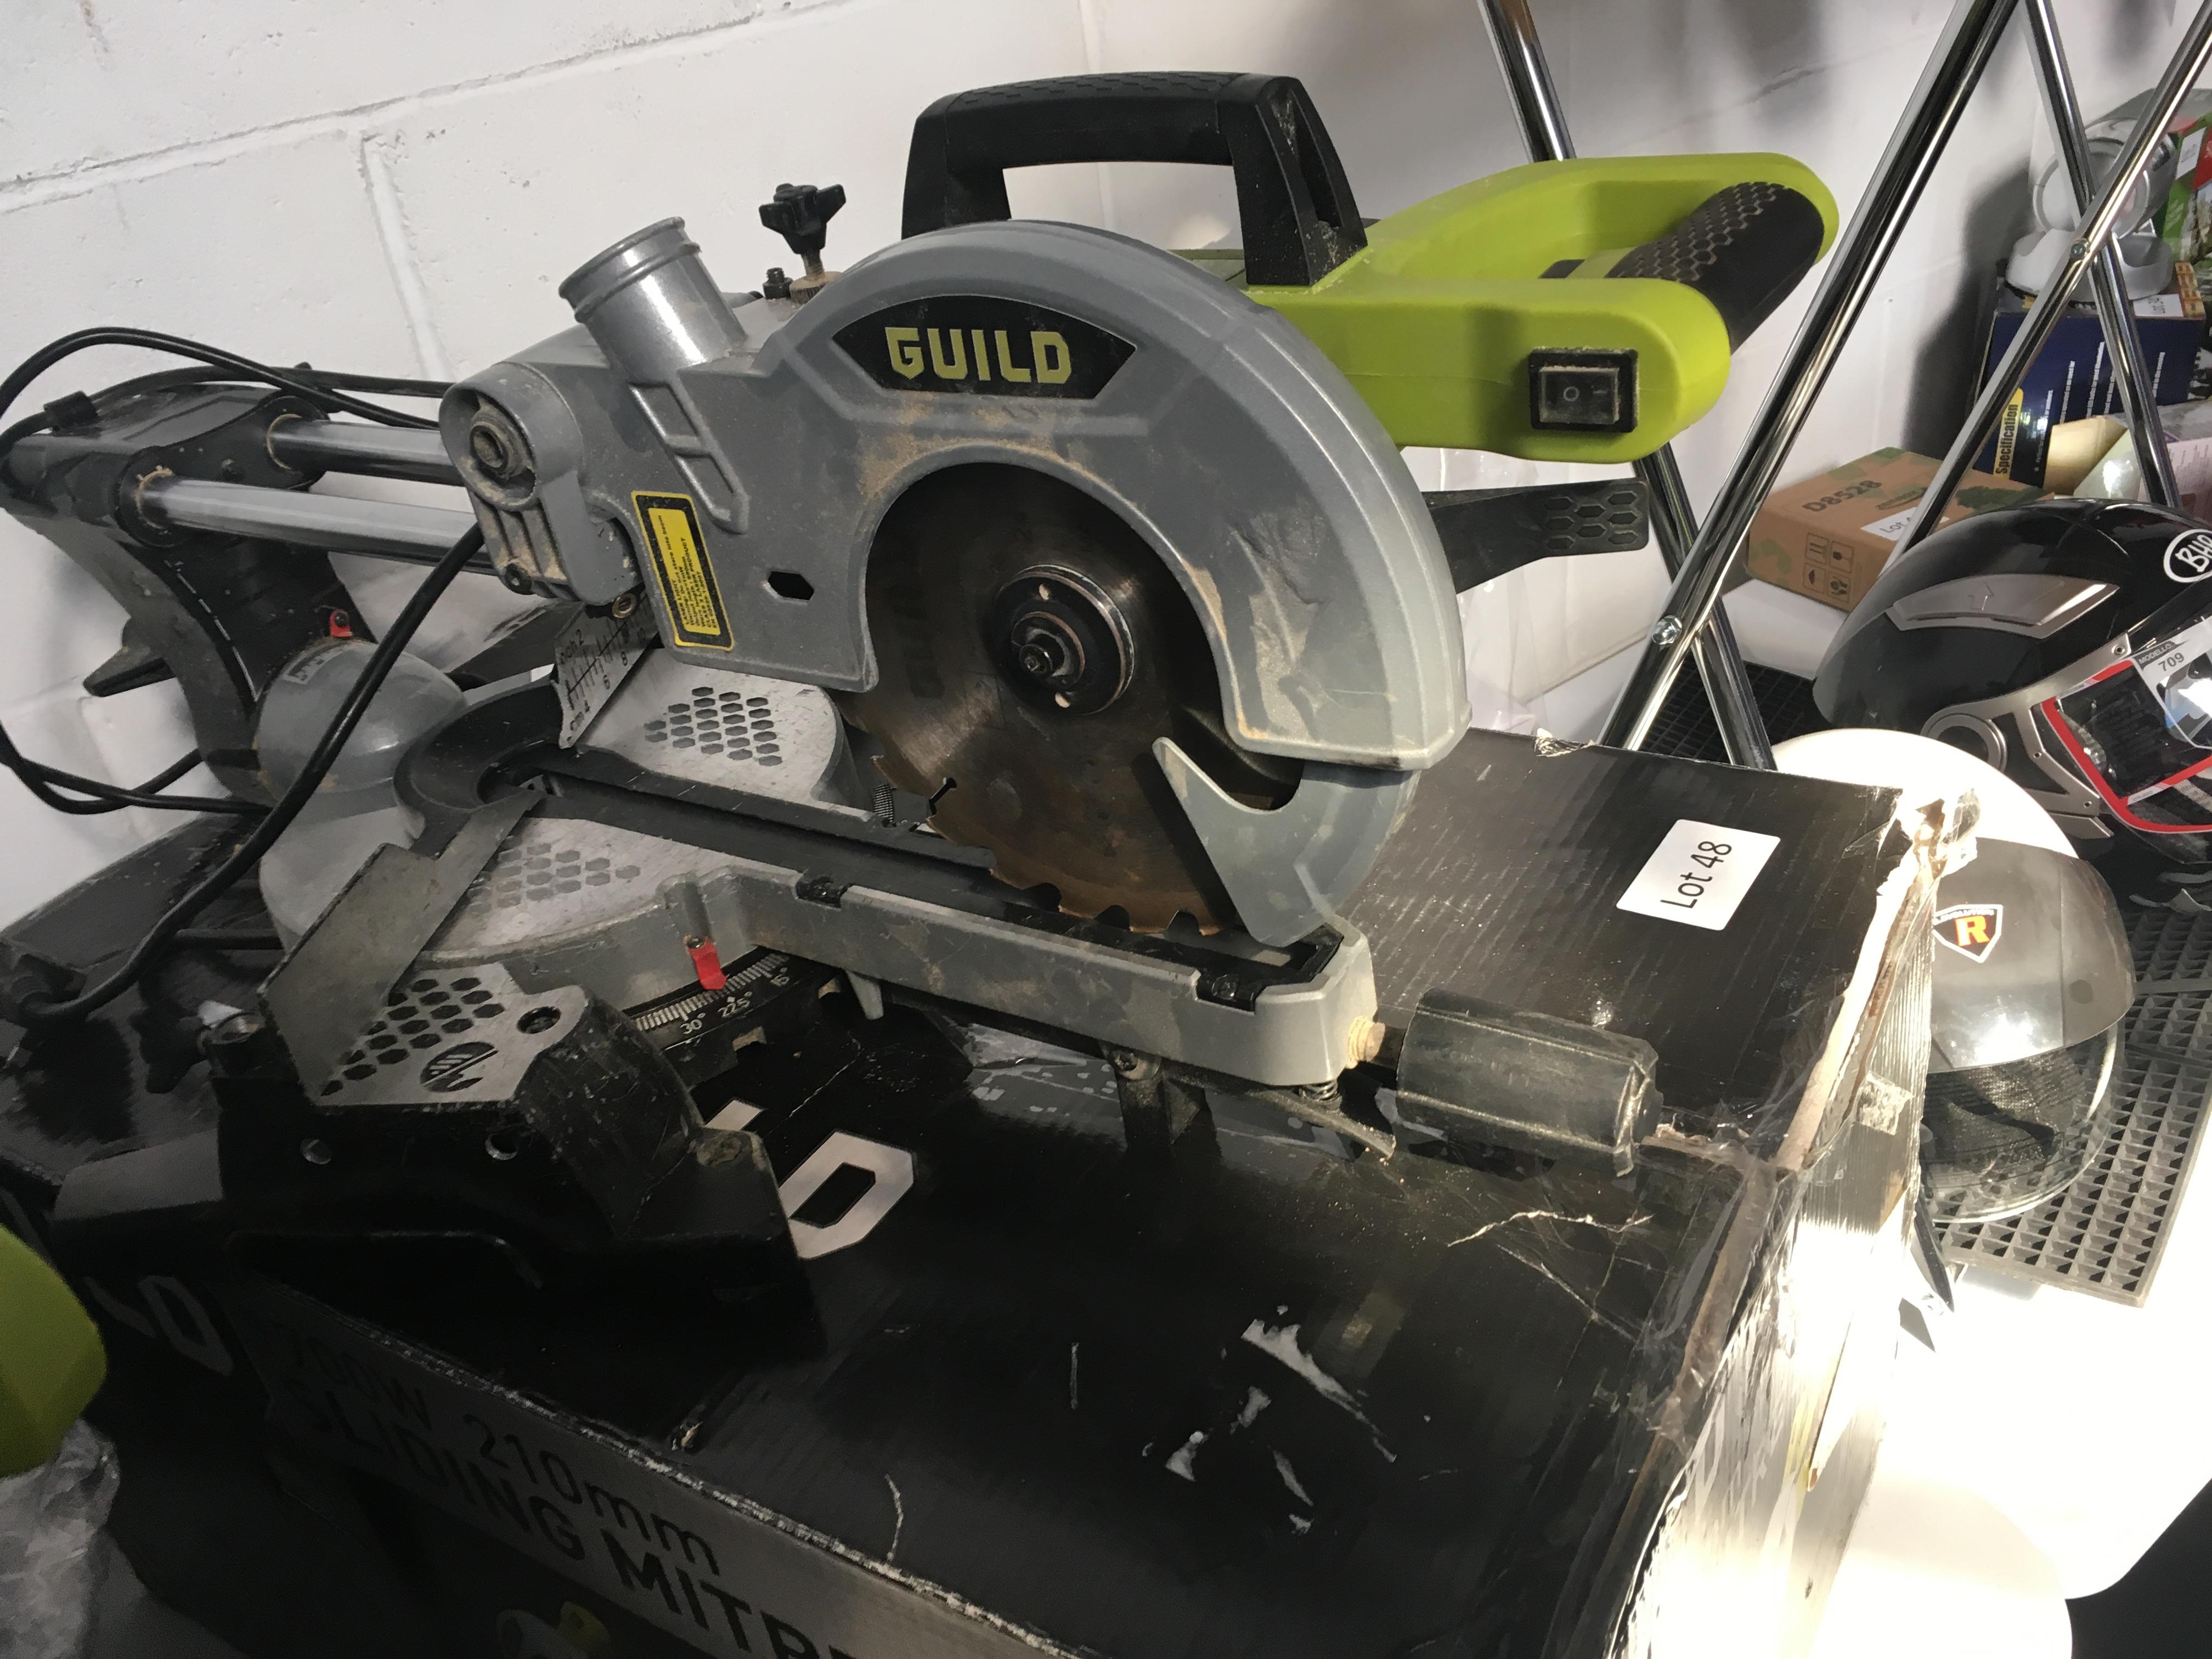 Lot 48 - Guild 1700W / 210mm sliding mitre saw. Working customer return.